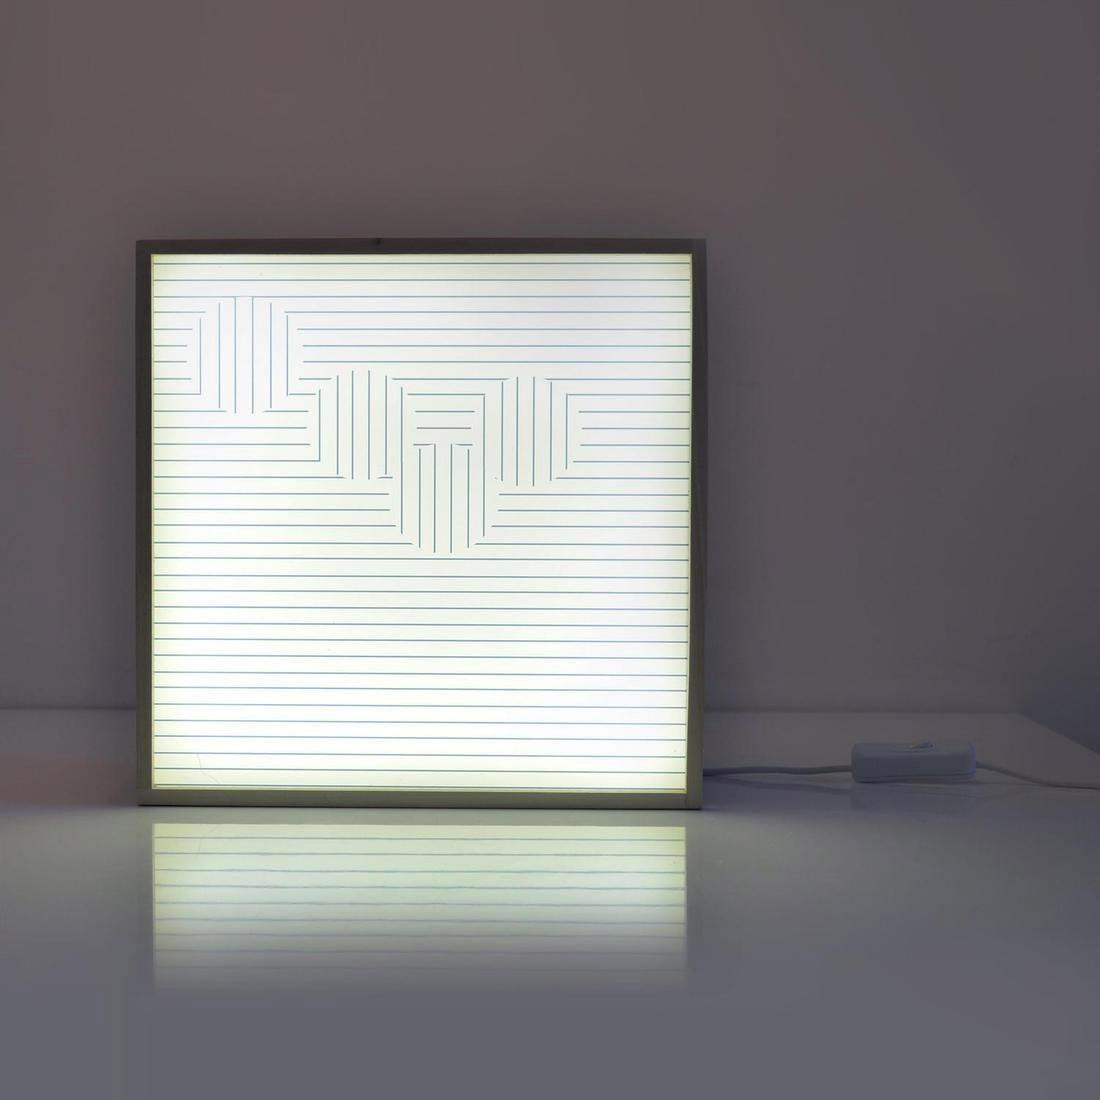 Boîte lumineuse, design, bois, DADA LIGHT Stand out